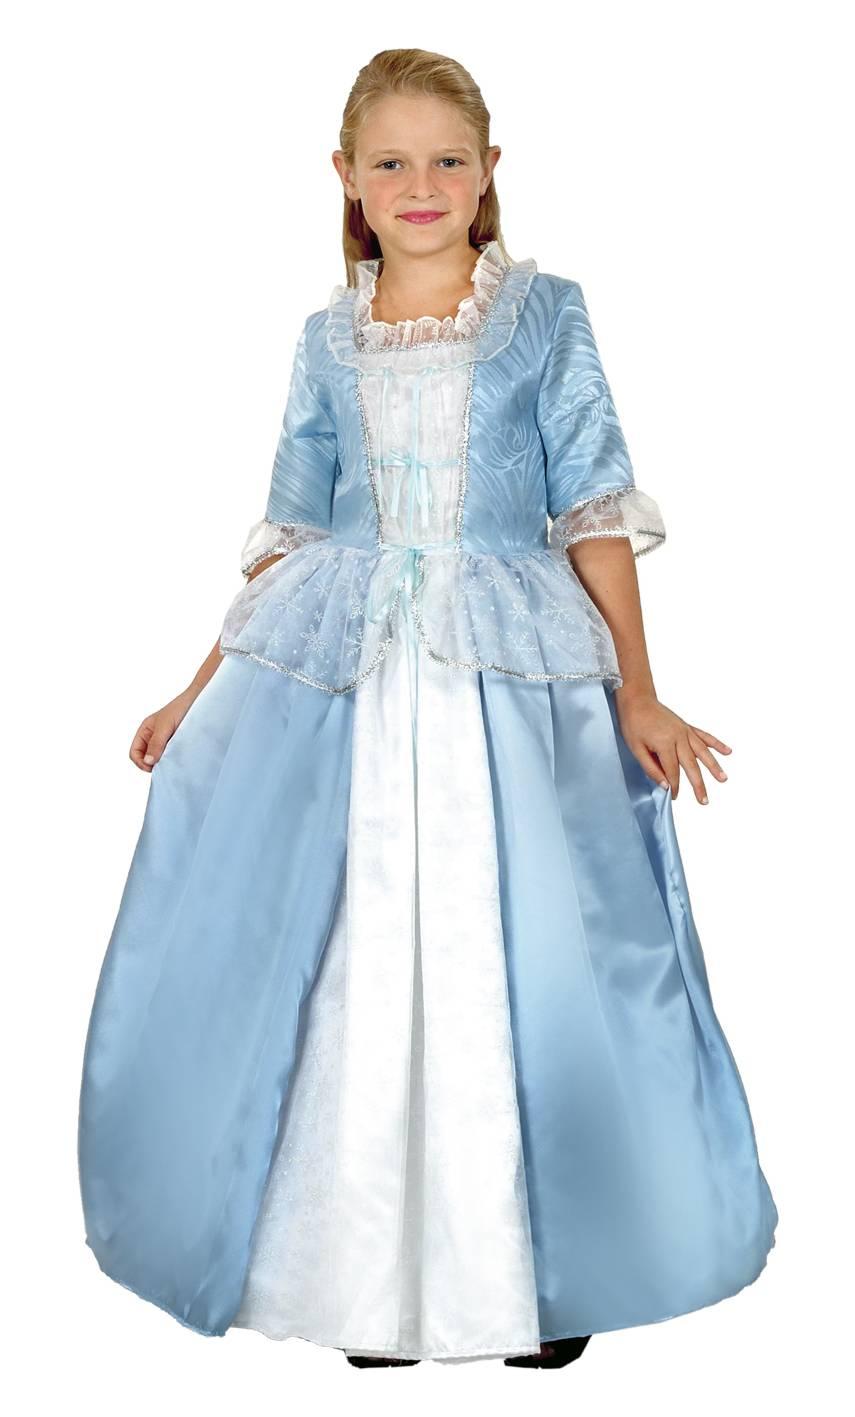 robe de princesse fille bleue d11 voir les stocks. Black Bedroom Furniture Sets. Home Design Ideas